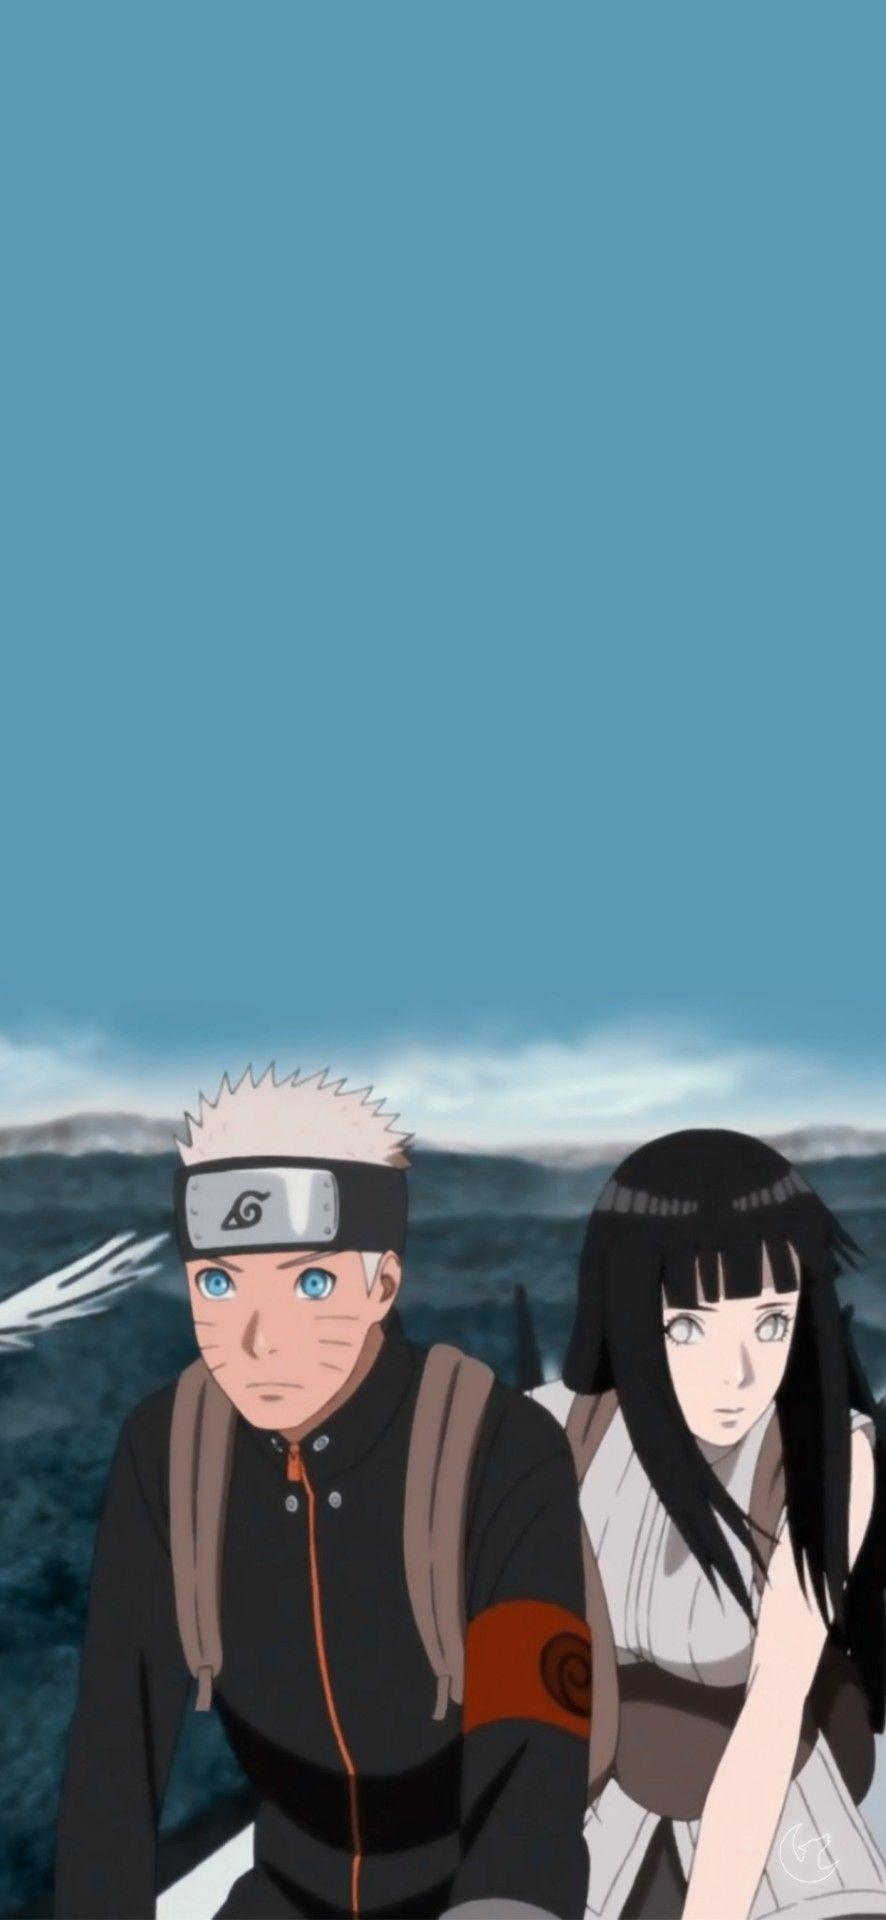 Parkedits Anime Anime Naruto Wallpaper Naruto Shippuden Iphone cute naruto and hinata wallpaper